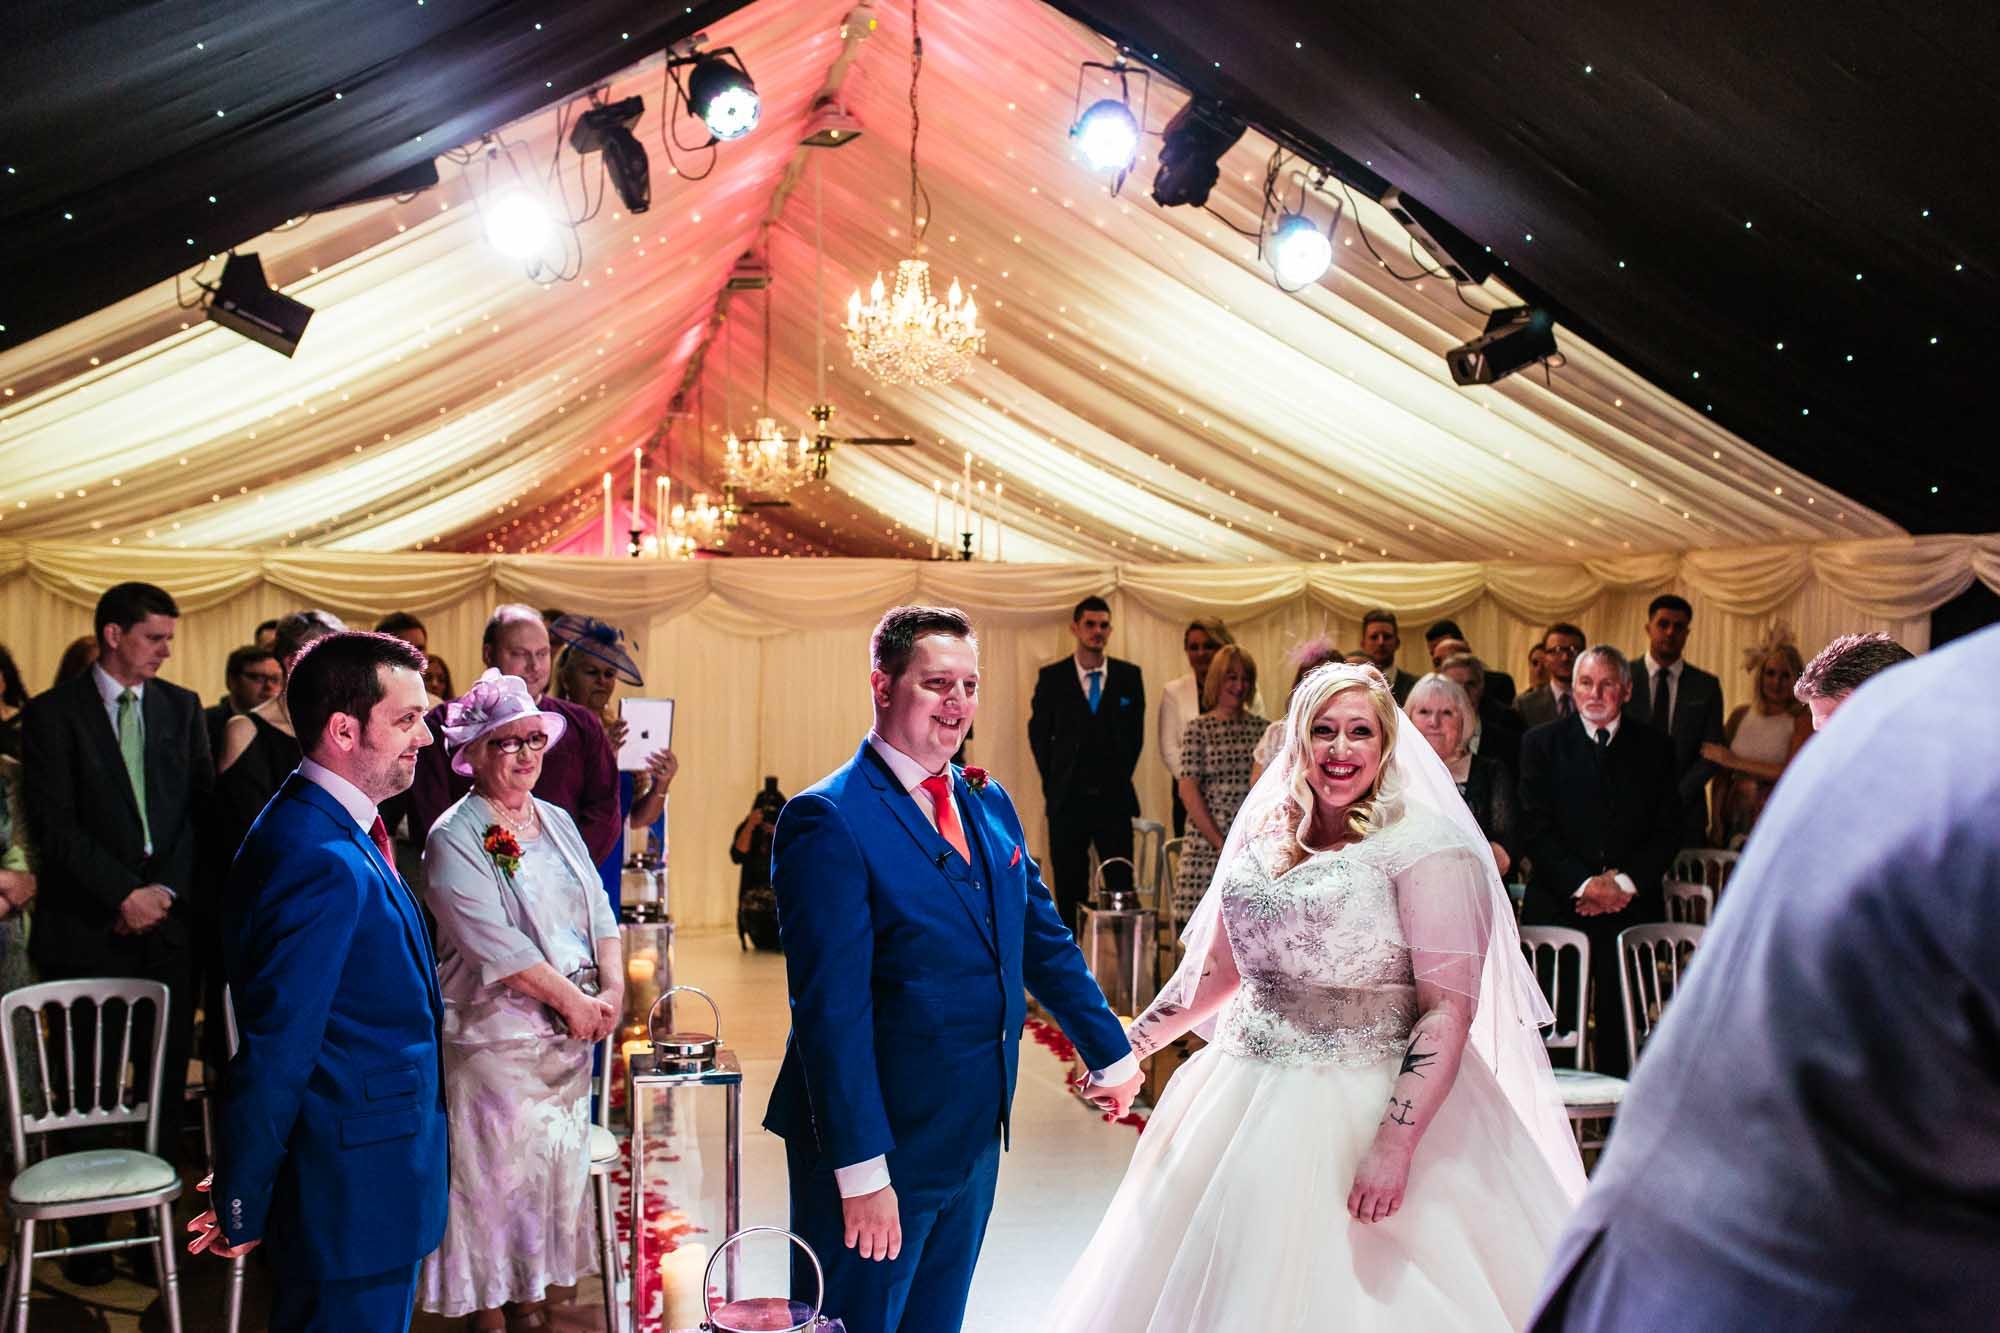 Heaton House Farm Wedding Ceremony